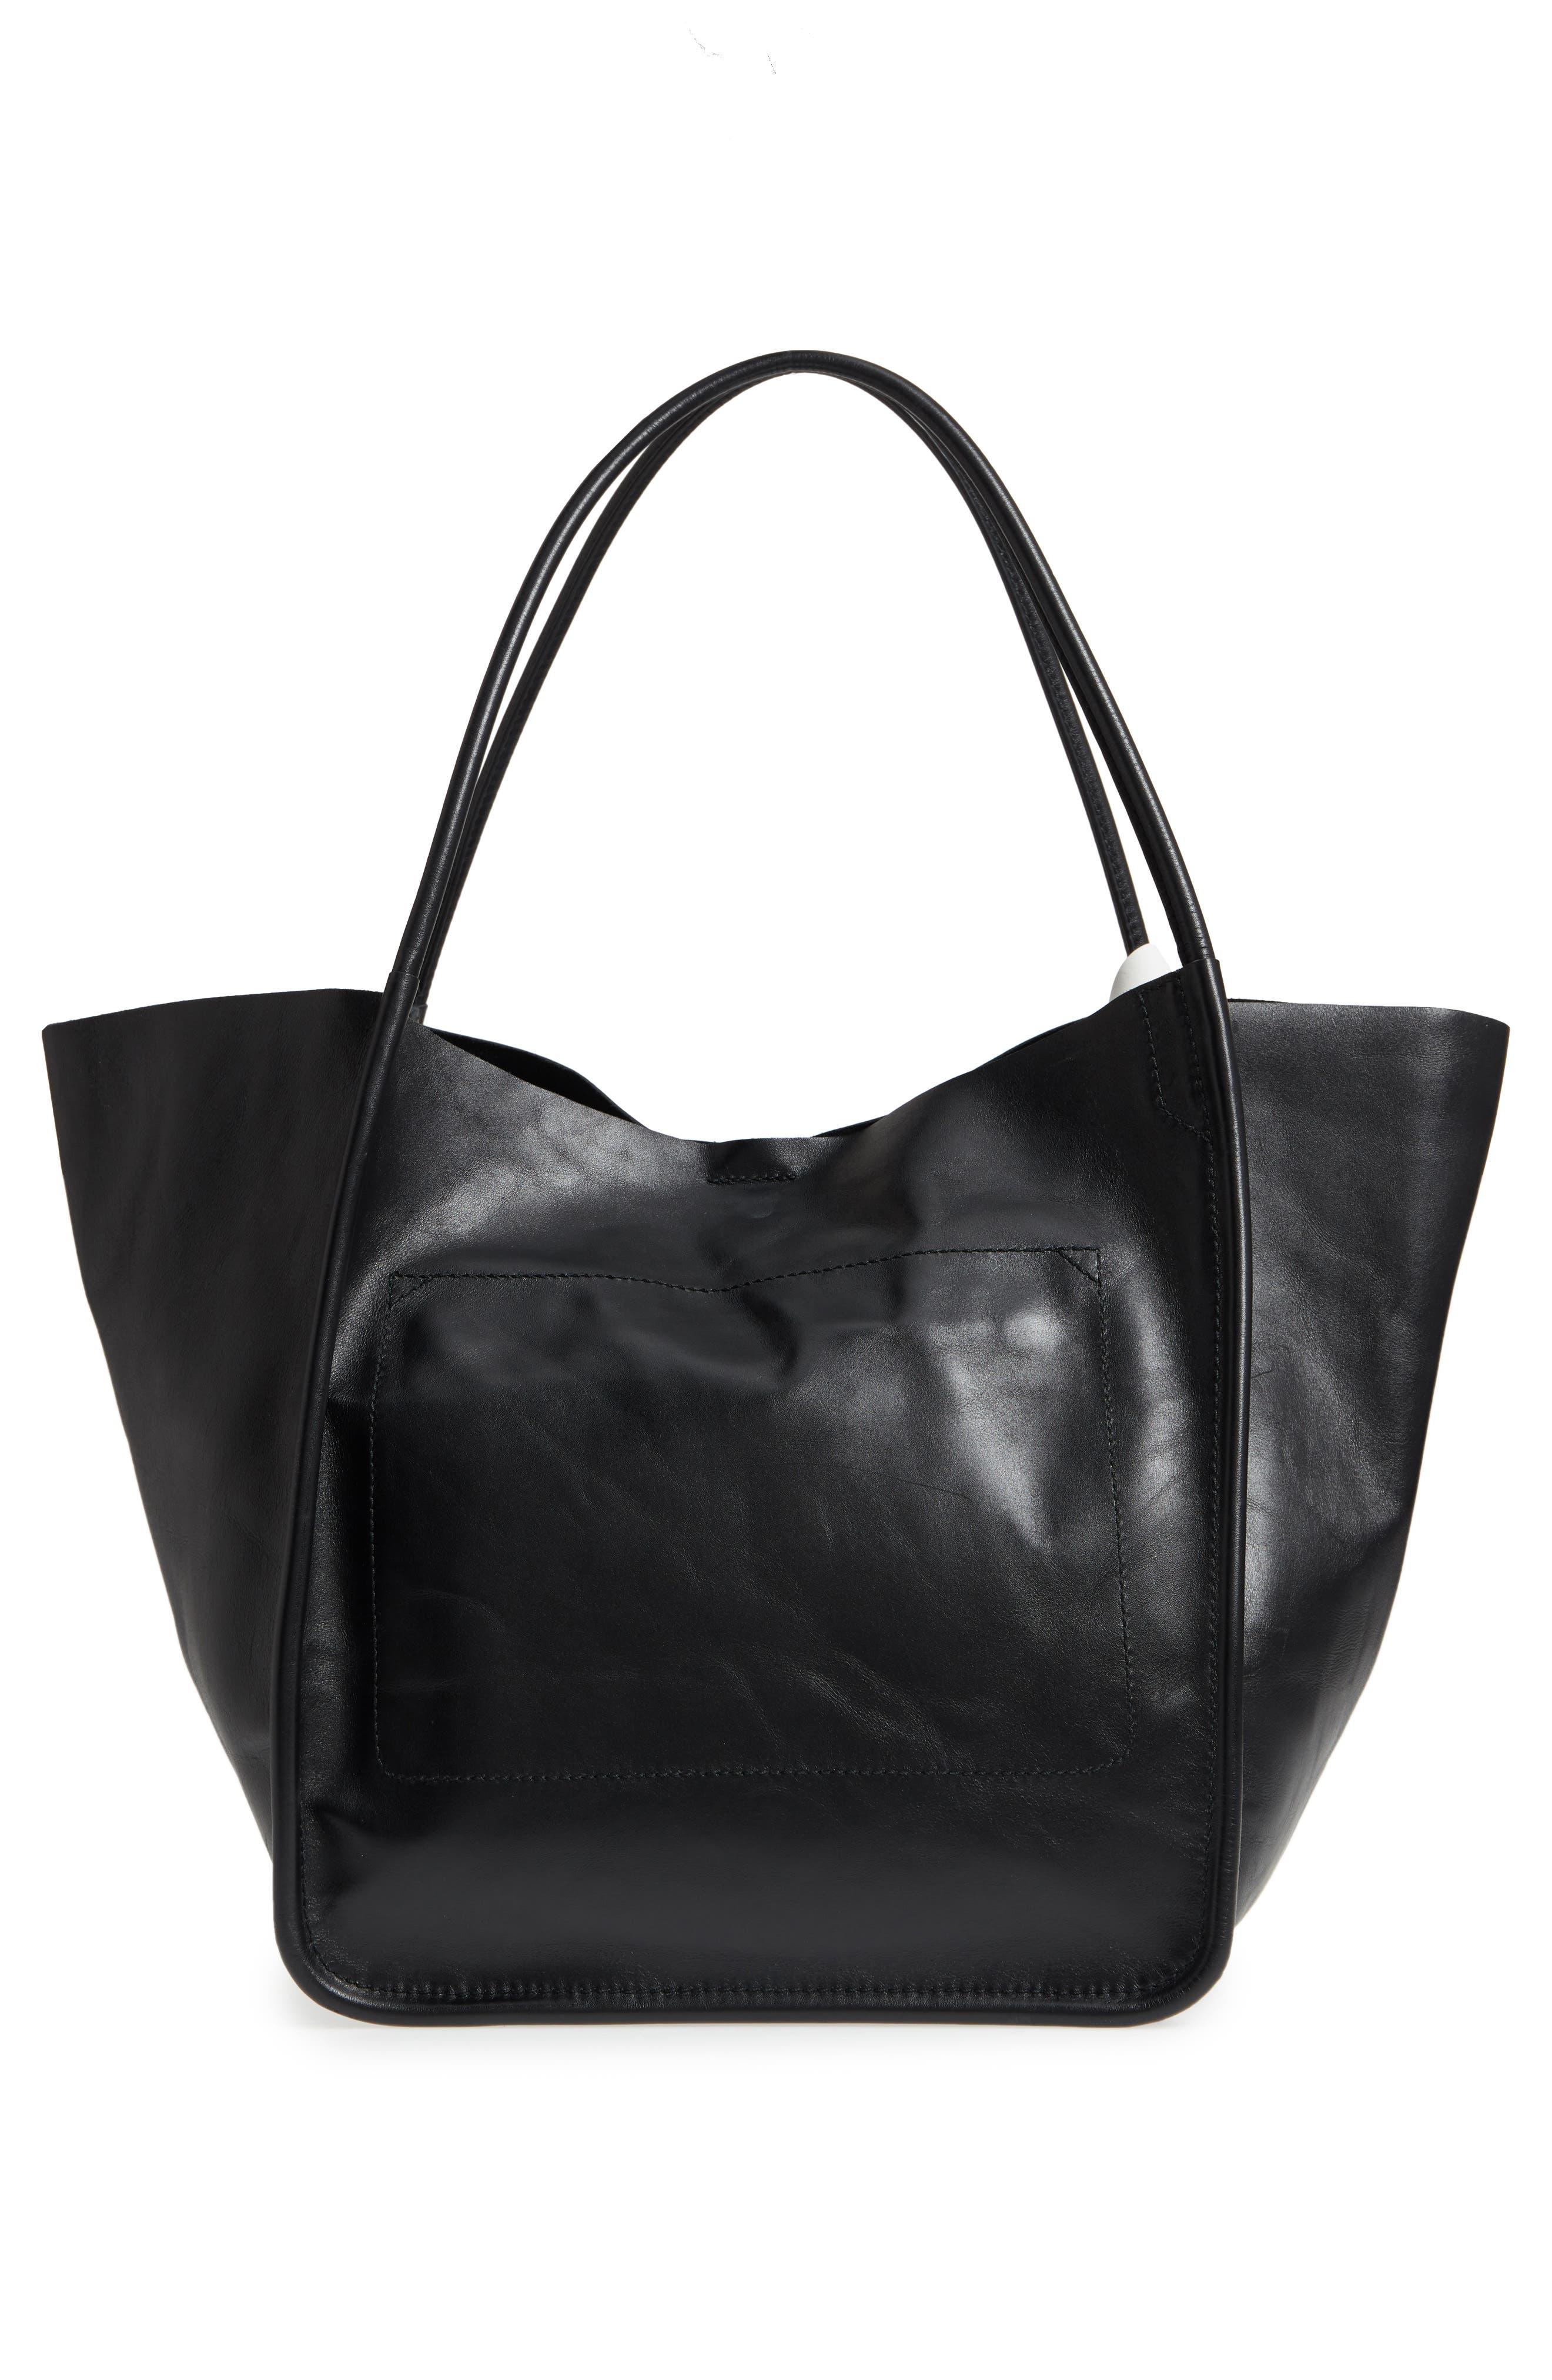 PROENZA SCHOULER, Large Calfskin Leather Tote, Alternate thumbnail 3, color, BLACK